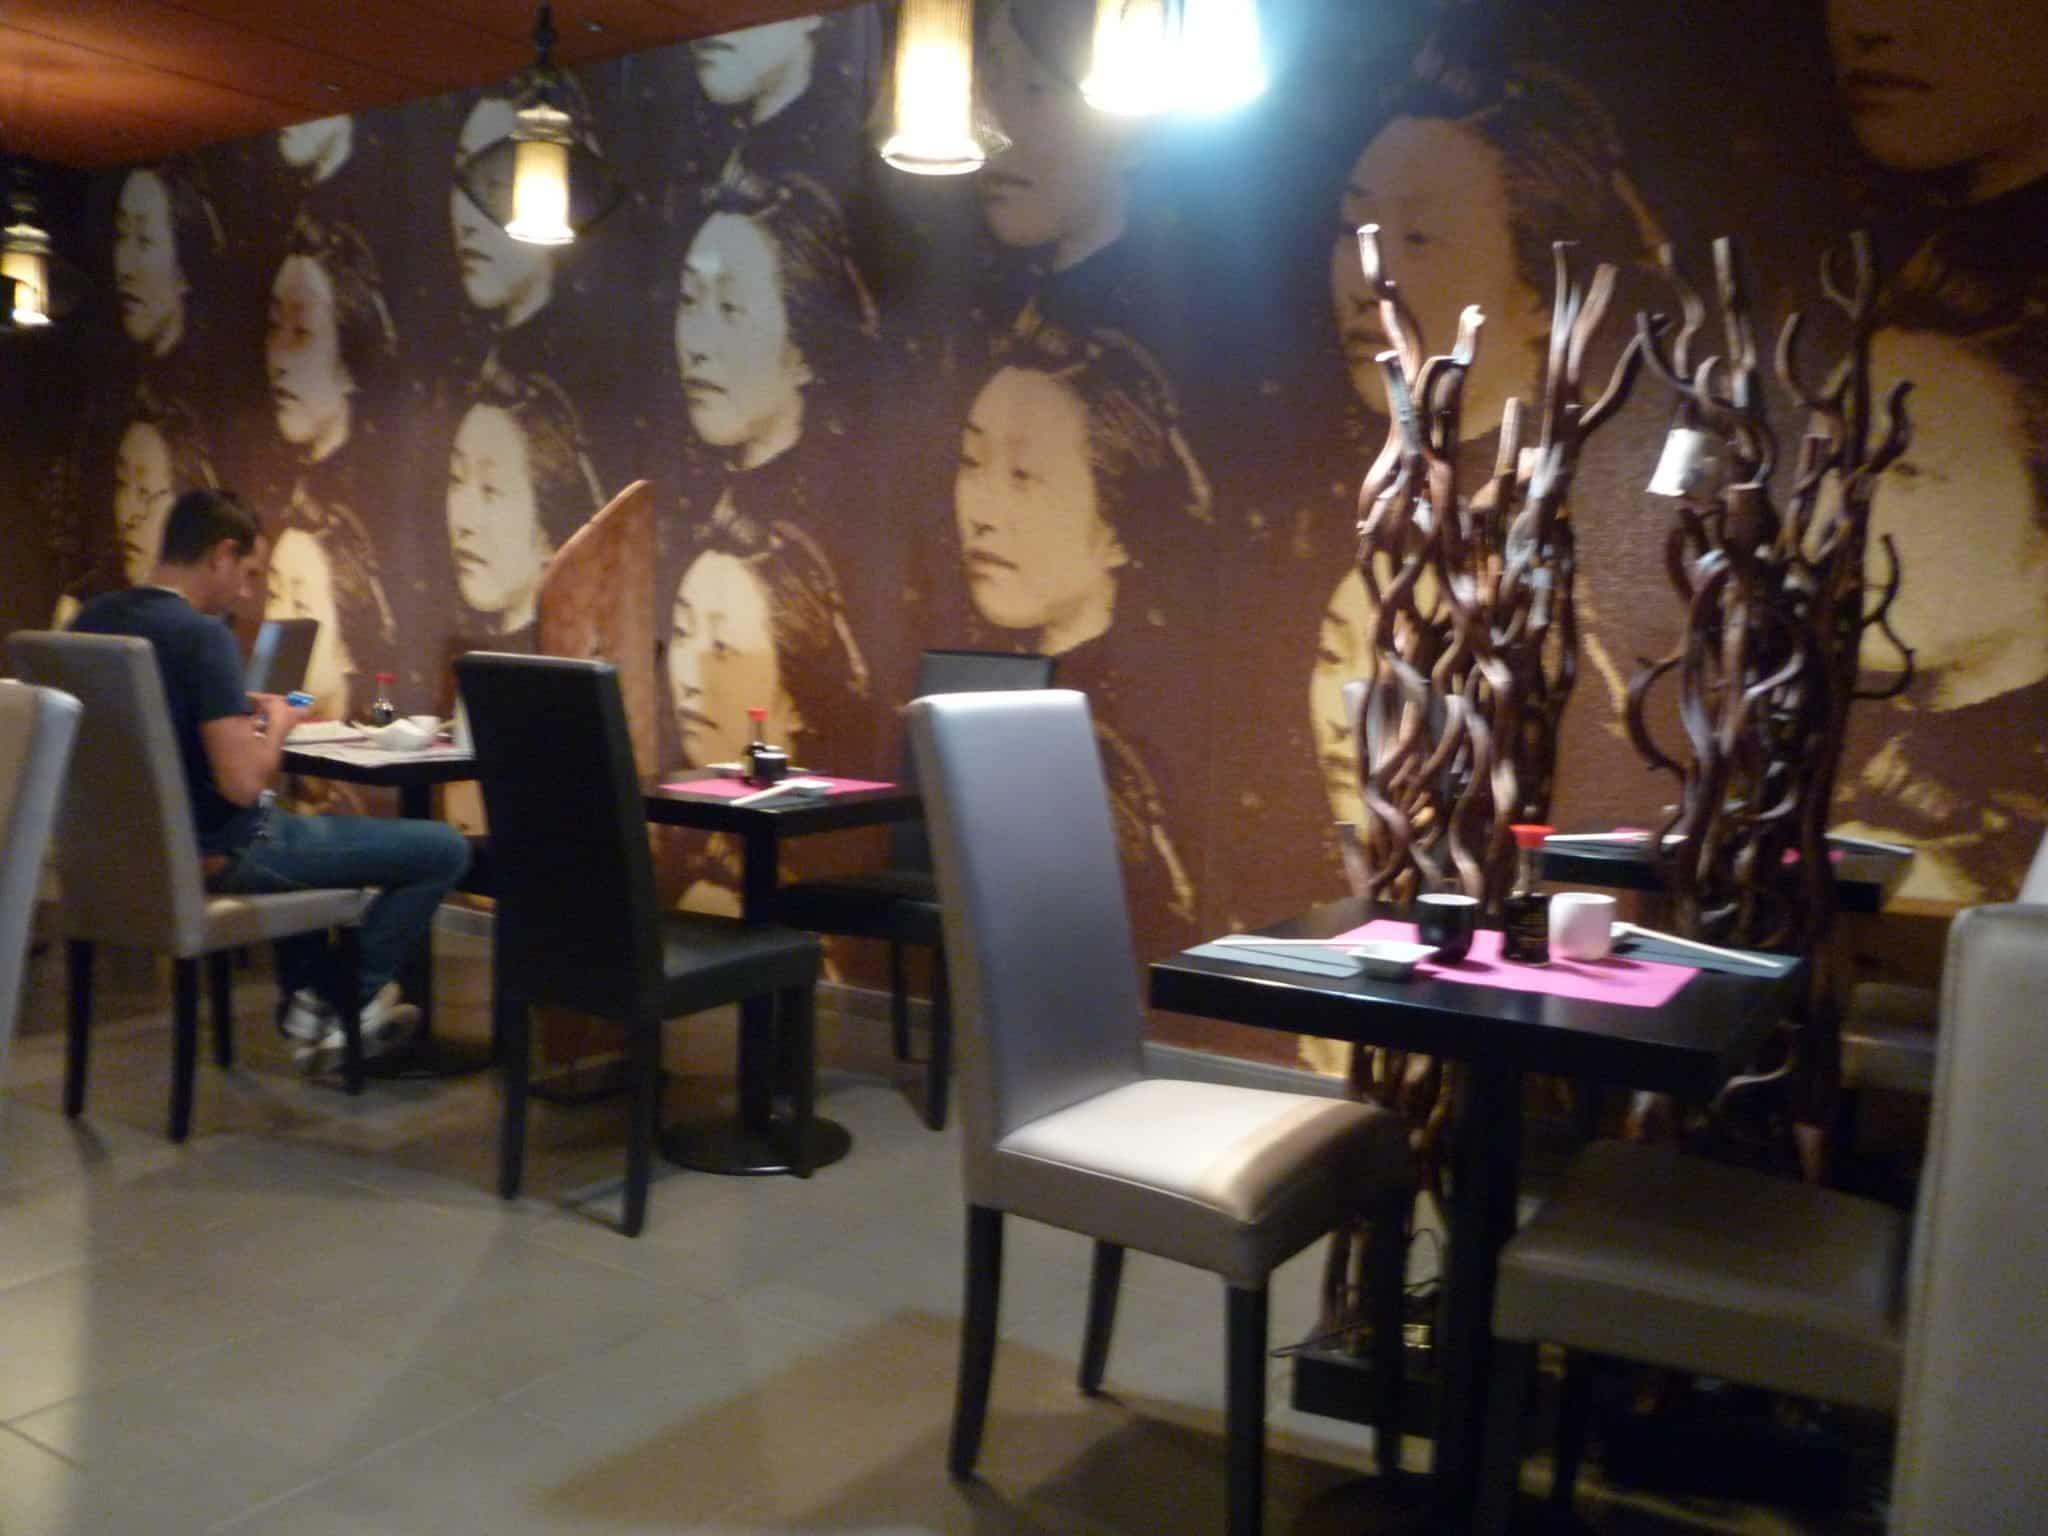 O manger des sushis salon de provence for Restaurant poisson salon de provence